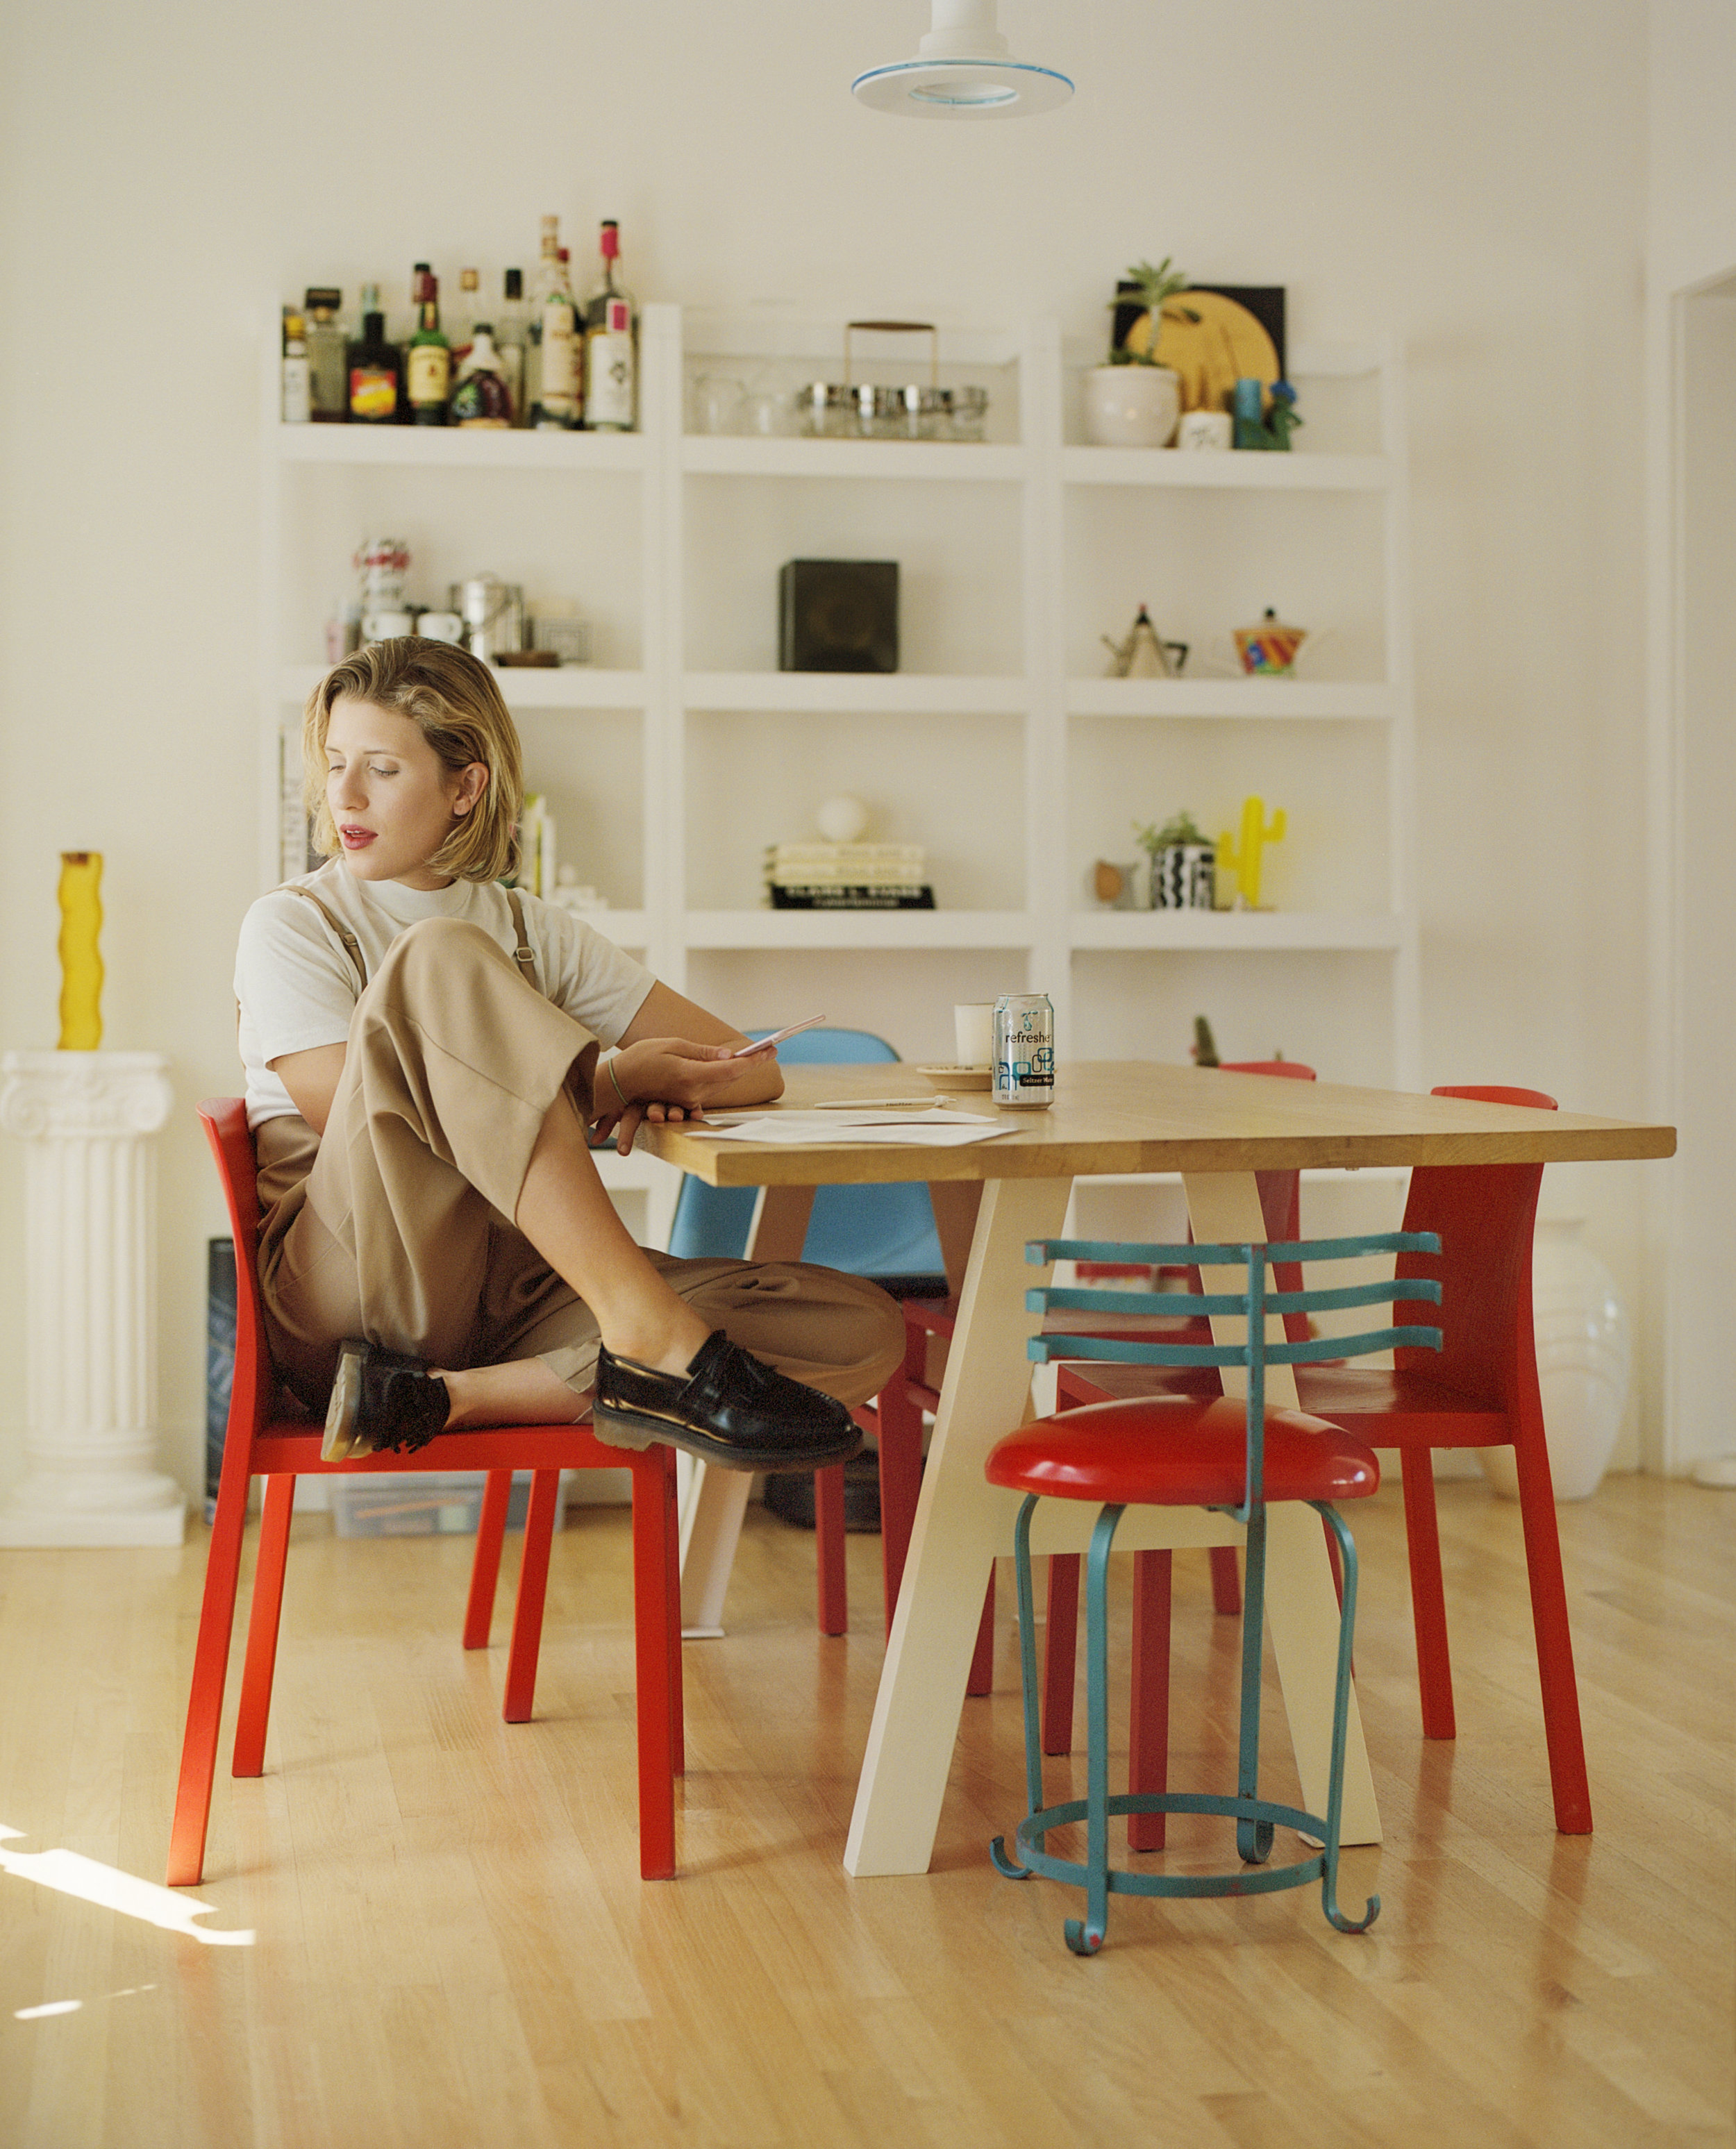 Apartamento_July18 (29)_R1.jpg